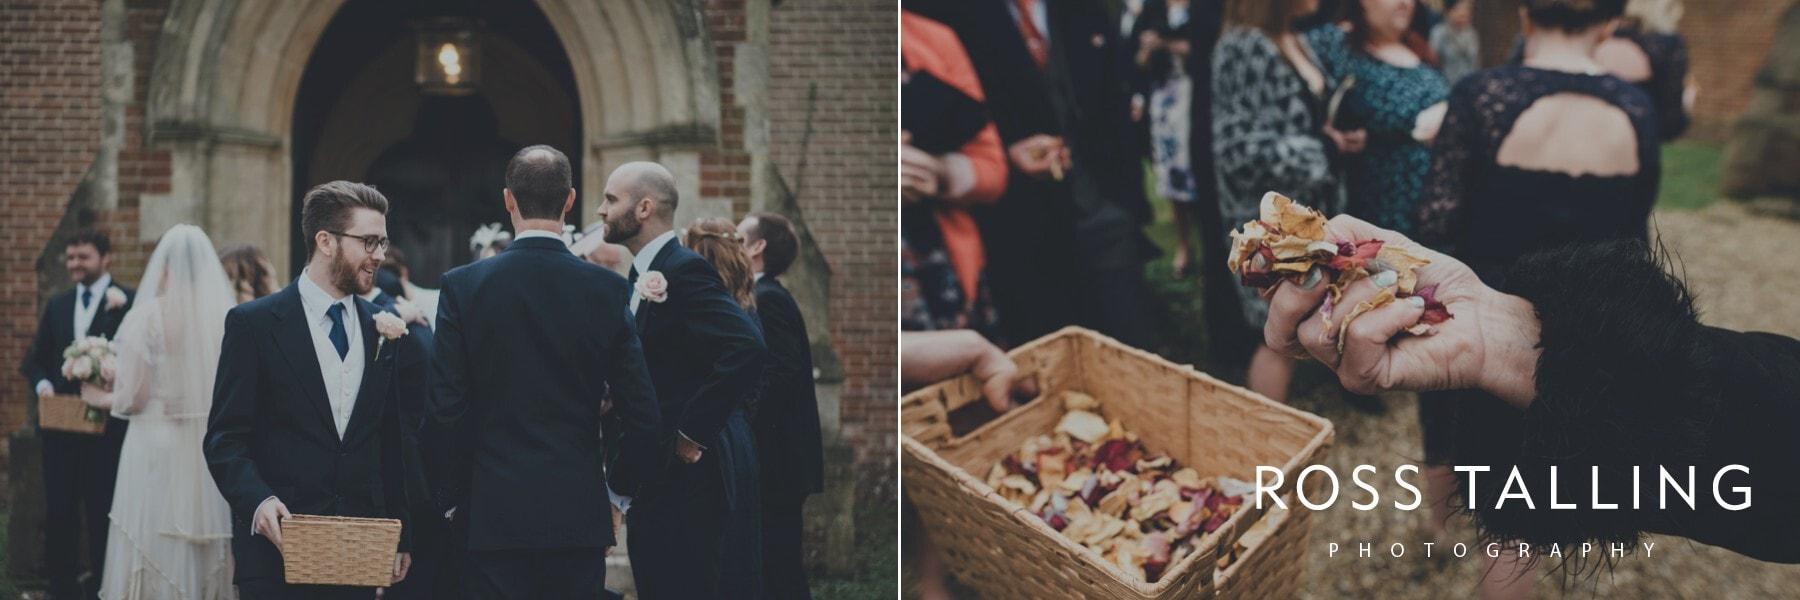 Louise & Matt UK Wedding Photography_0065